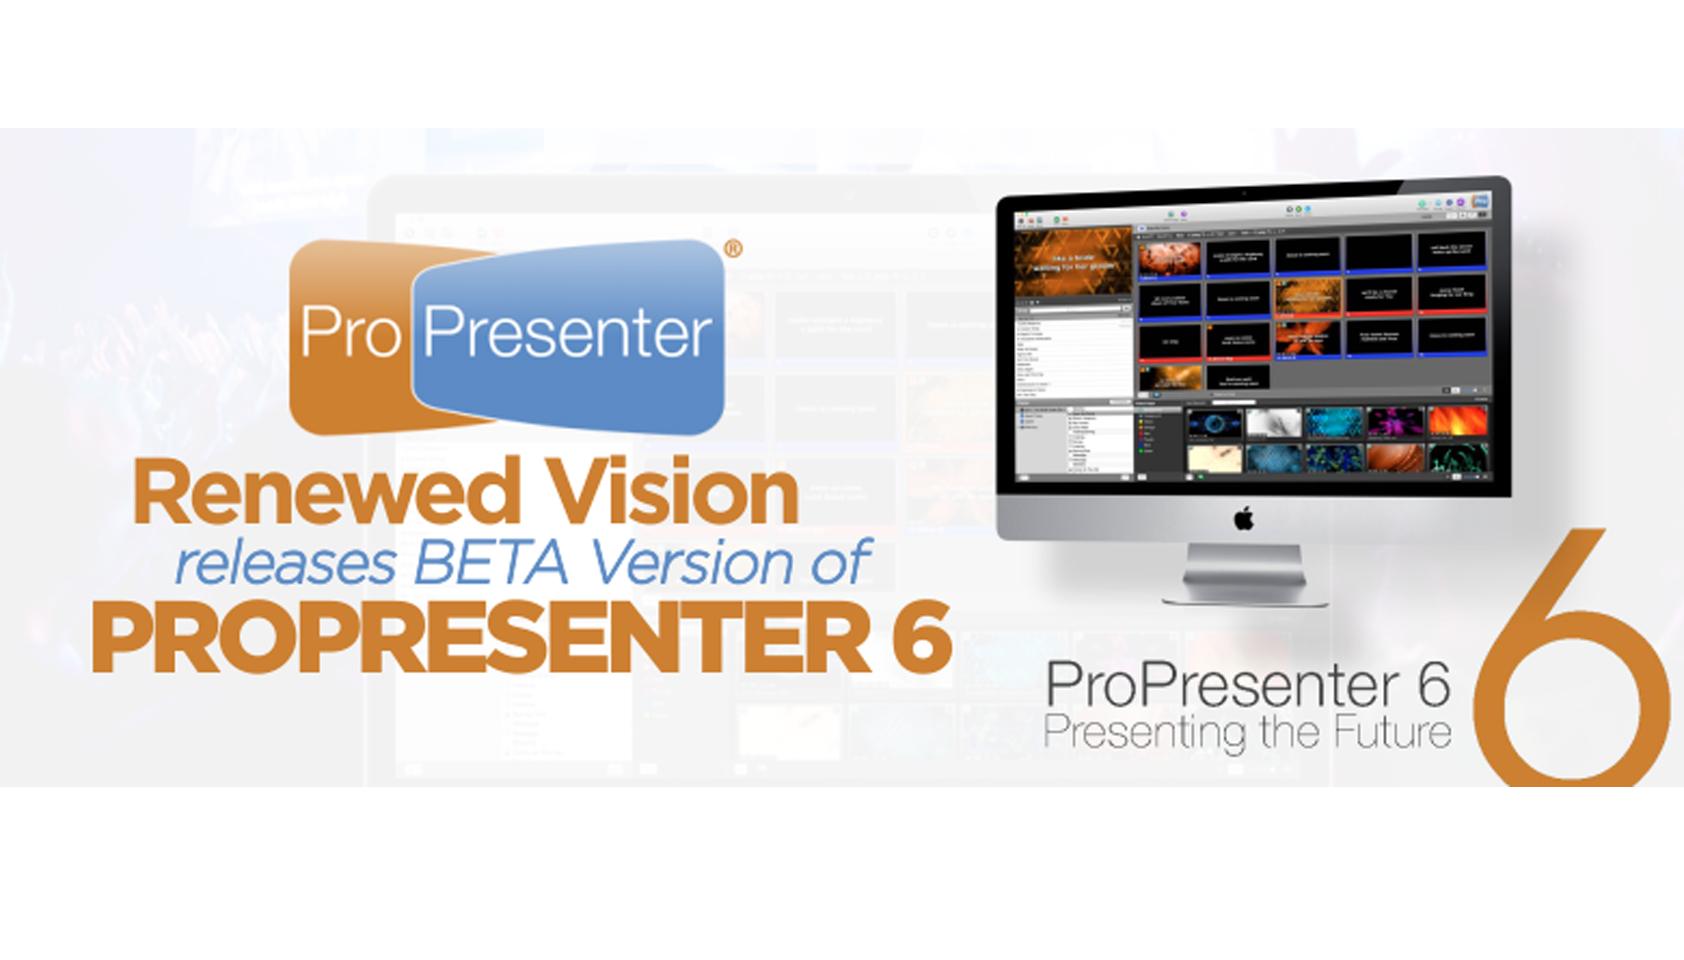 Renewed Vision Releases BETA Version of ProPresenter 6